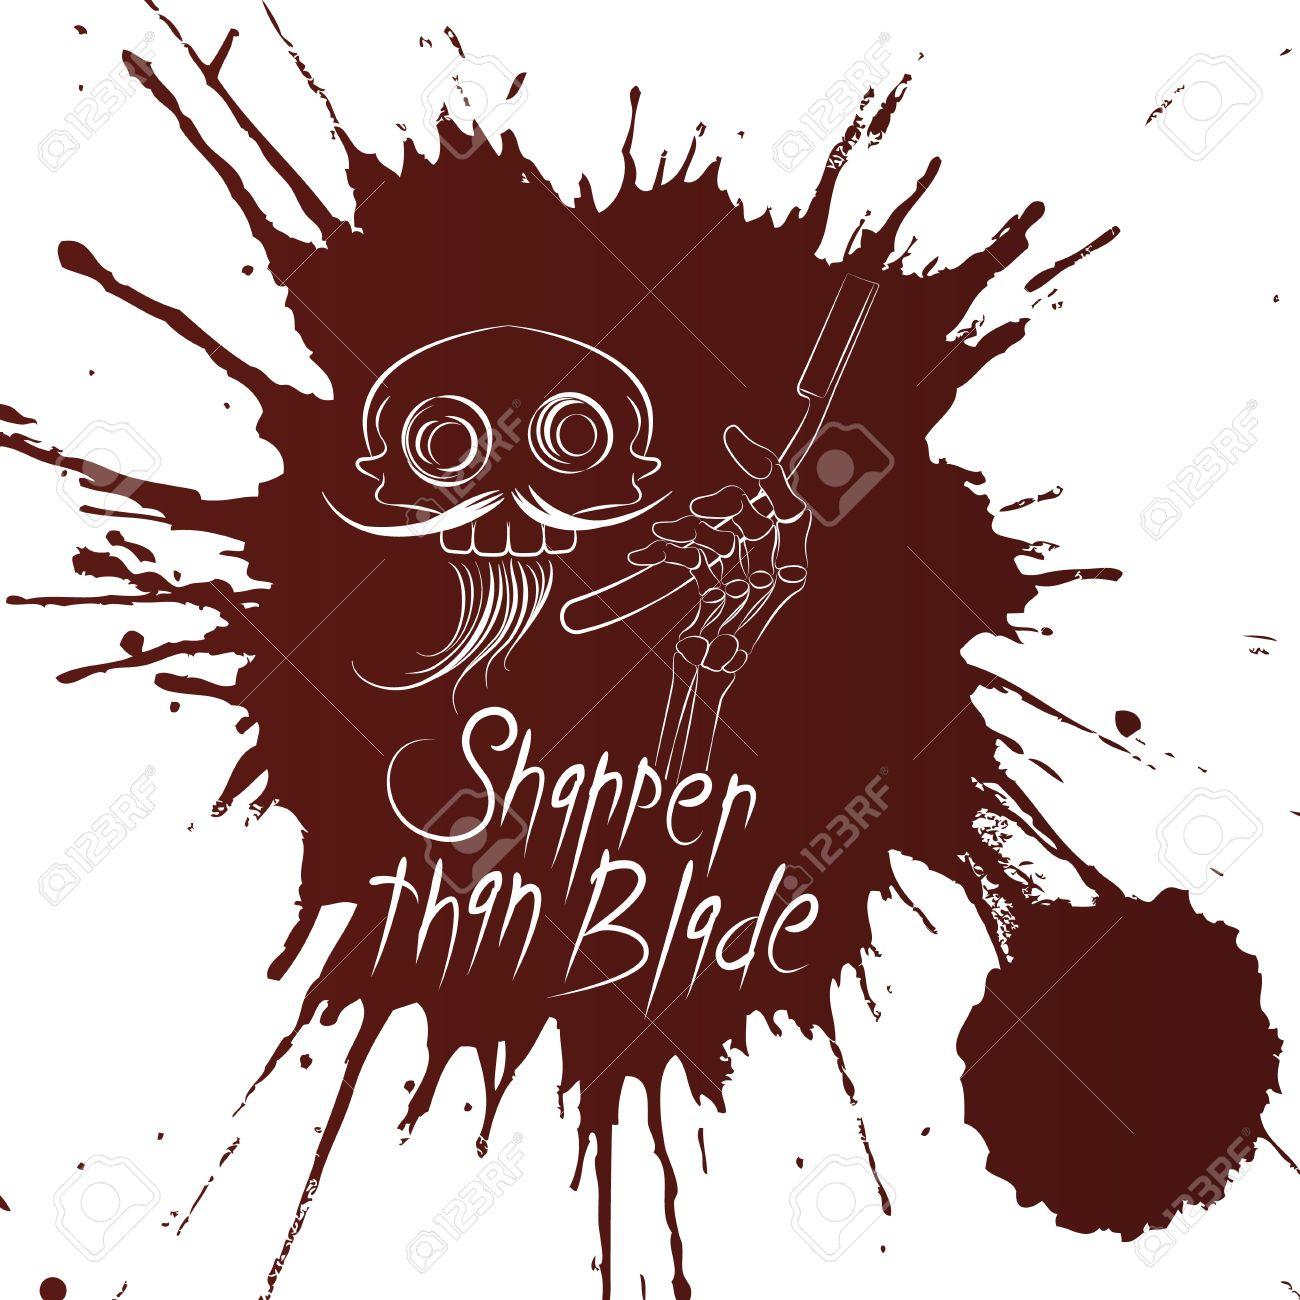 Skull Barber Tshirt Design On The Blood Background Royalty Free